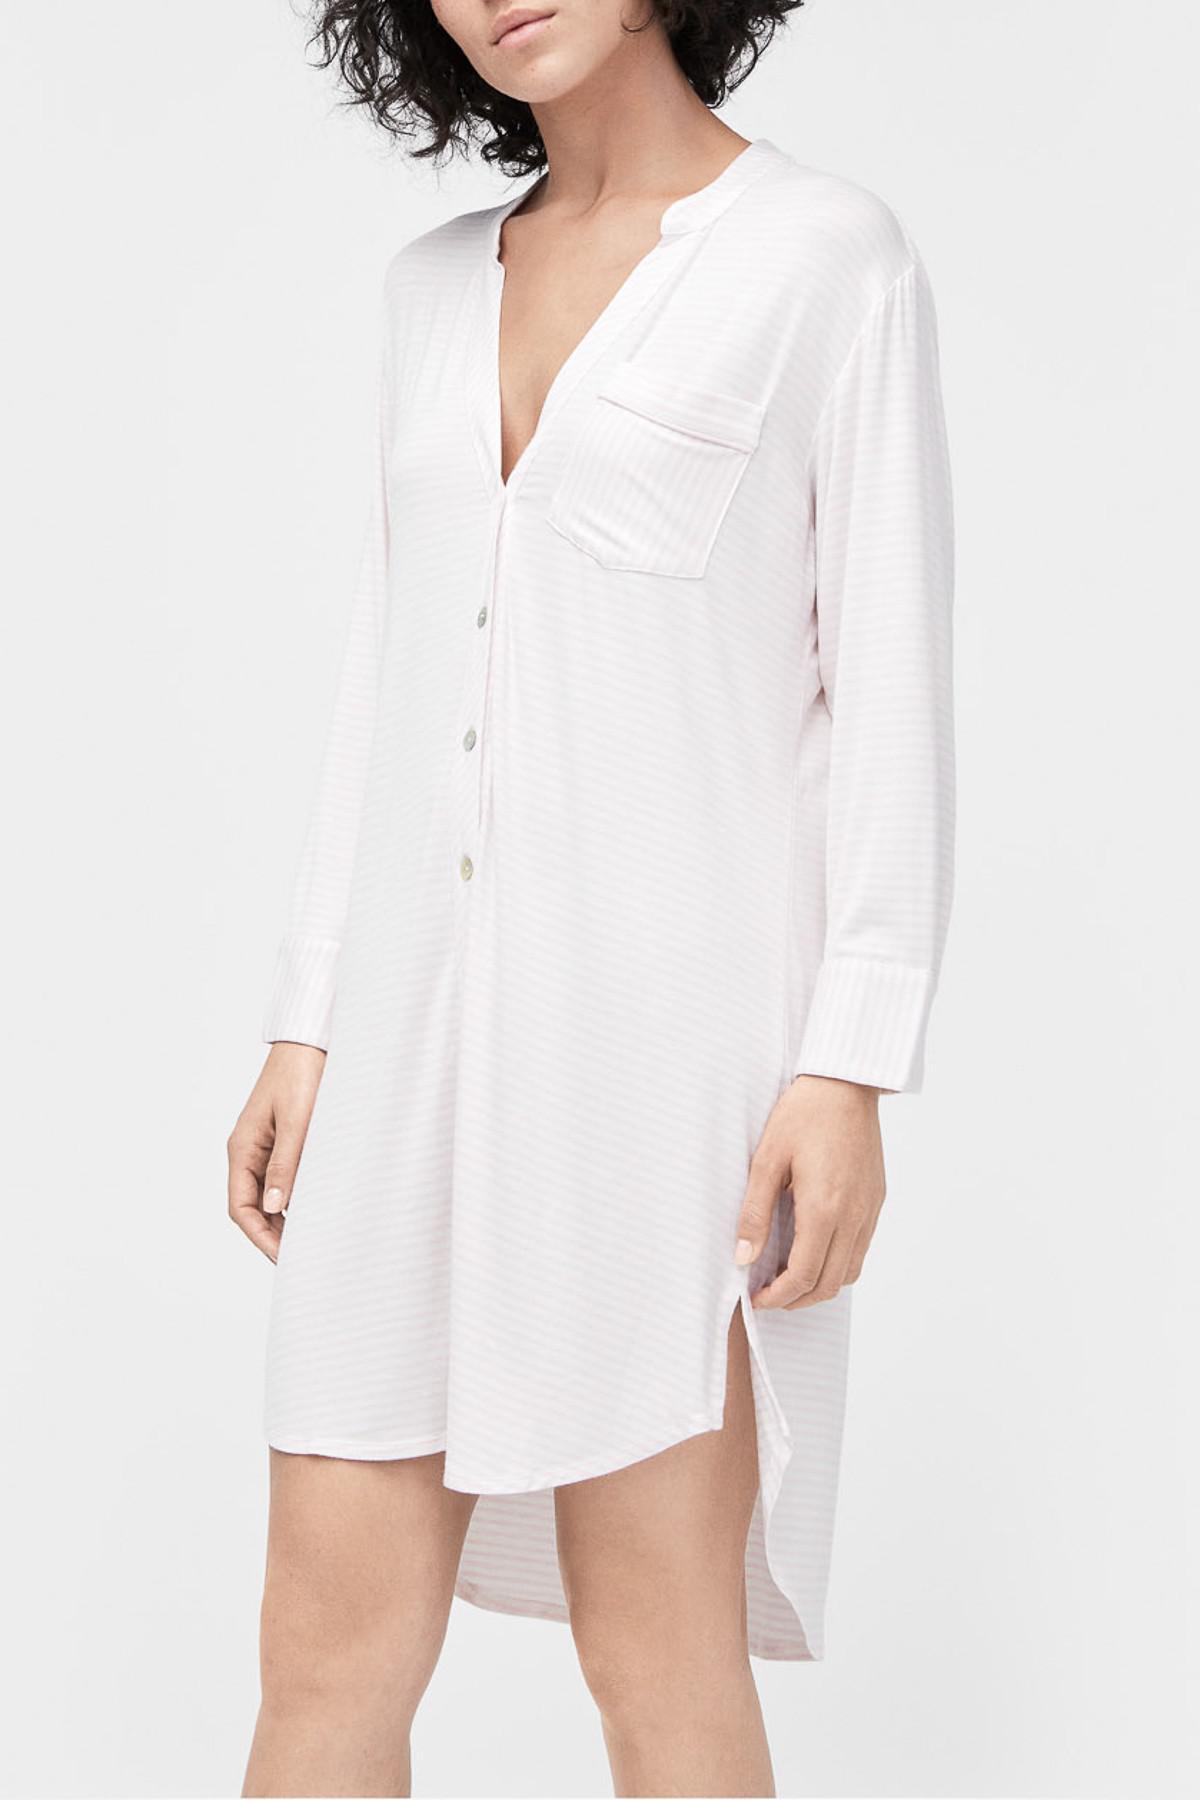 1785bce619 Lyst - UGG Vivian Stripe Knit 2-piece Pajama Shirt in White